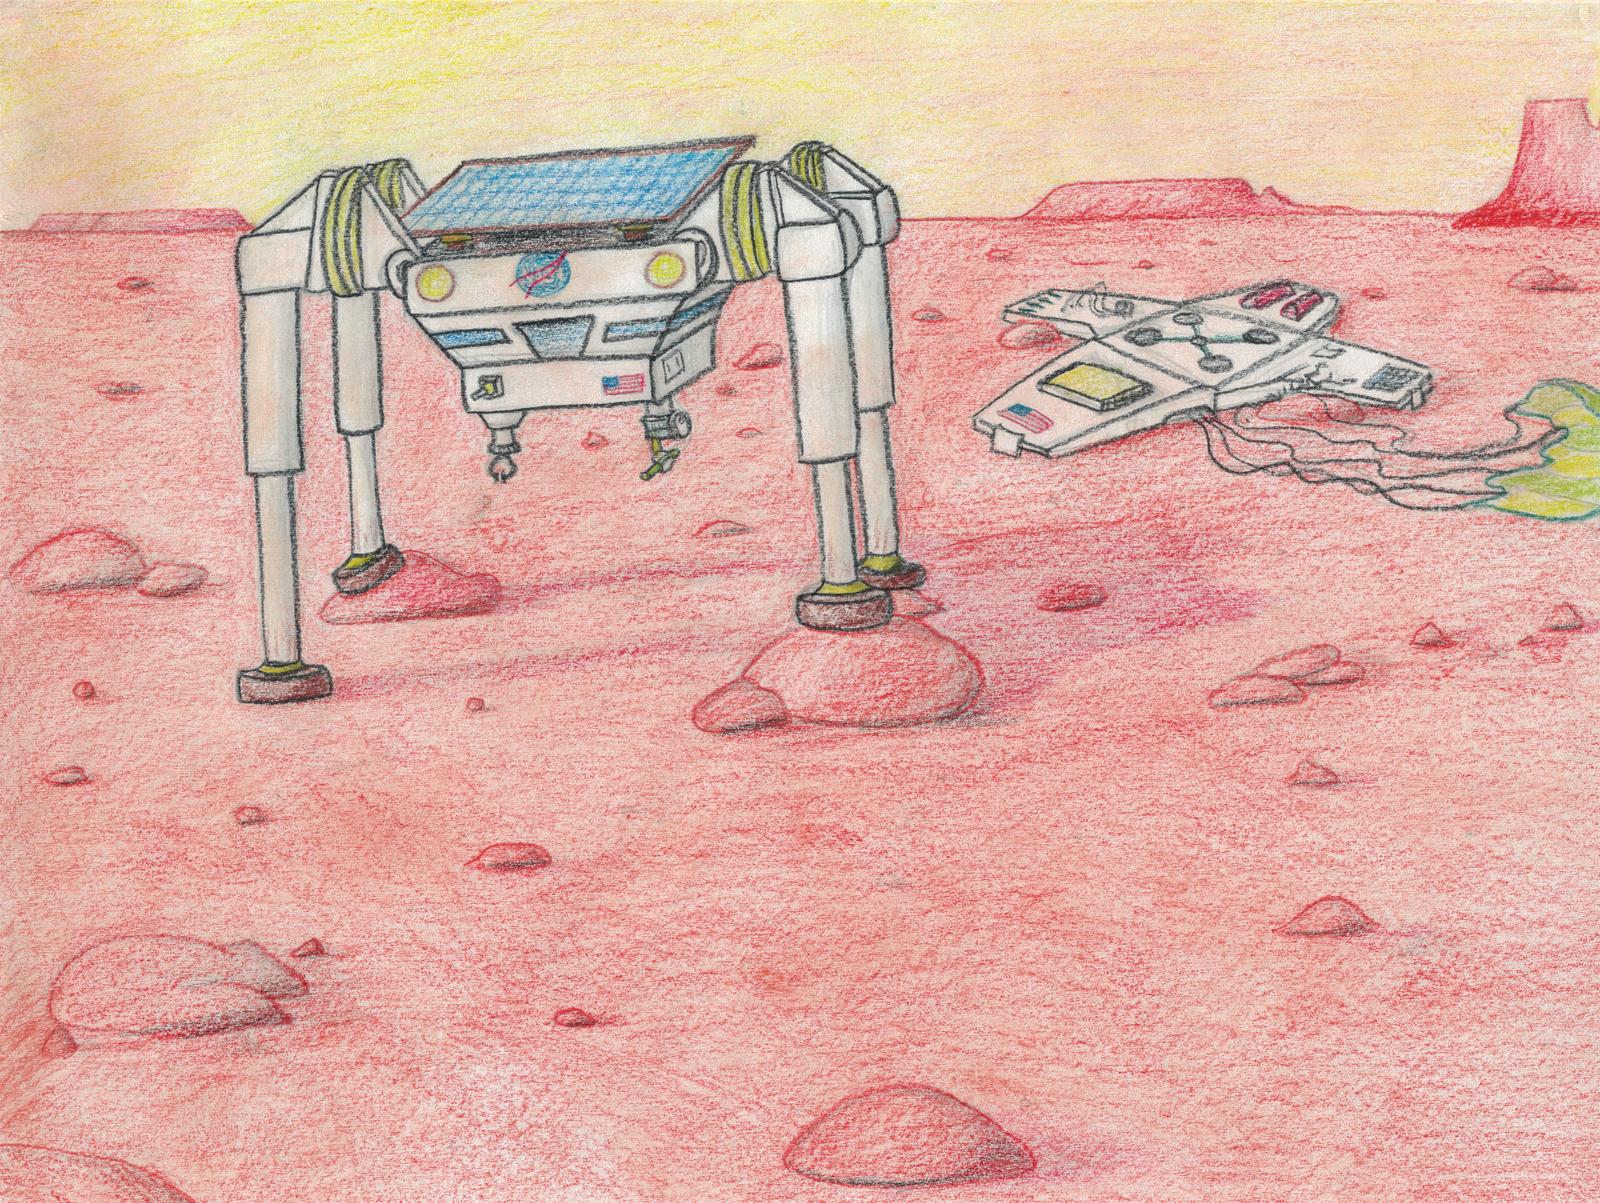 Walking on Mars by Ash243x